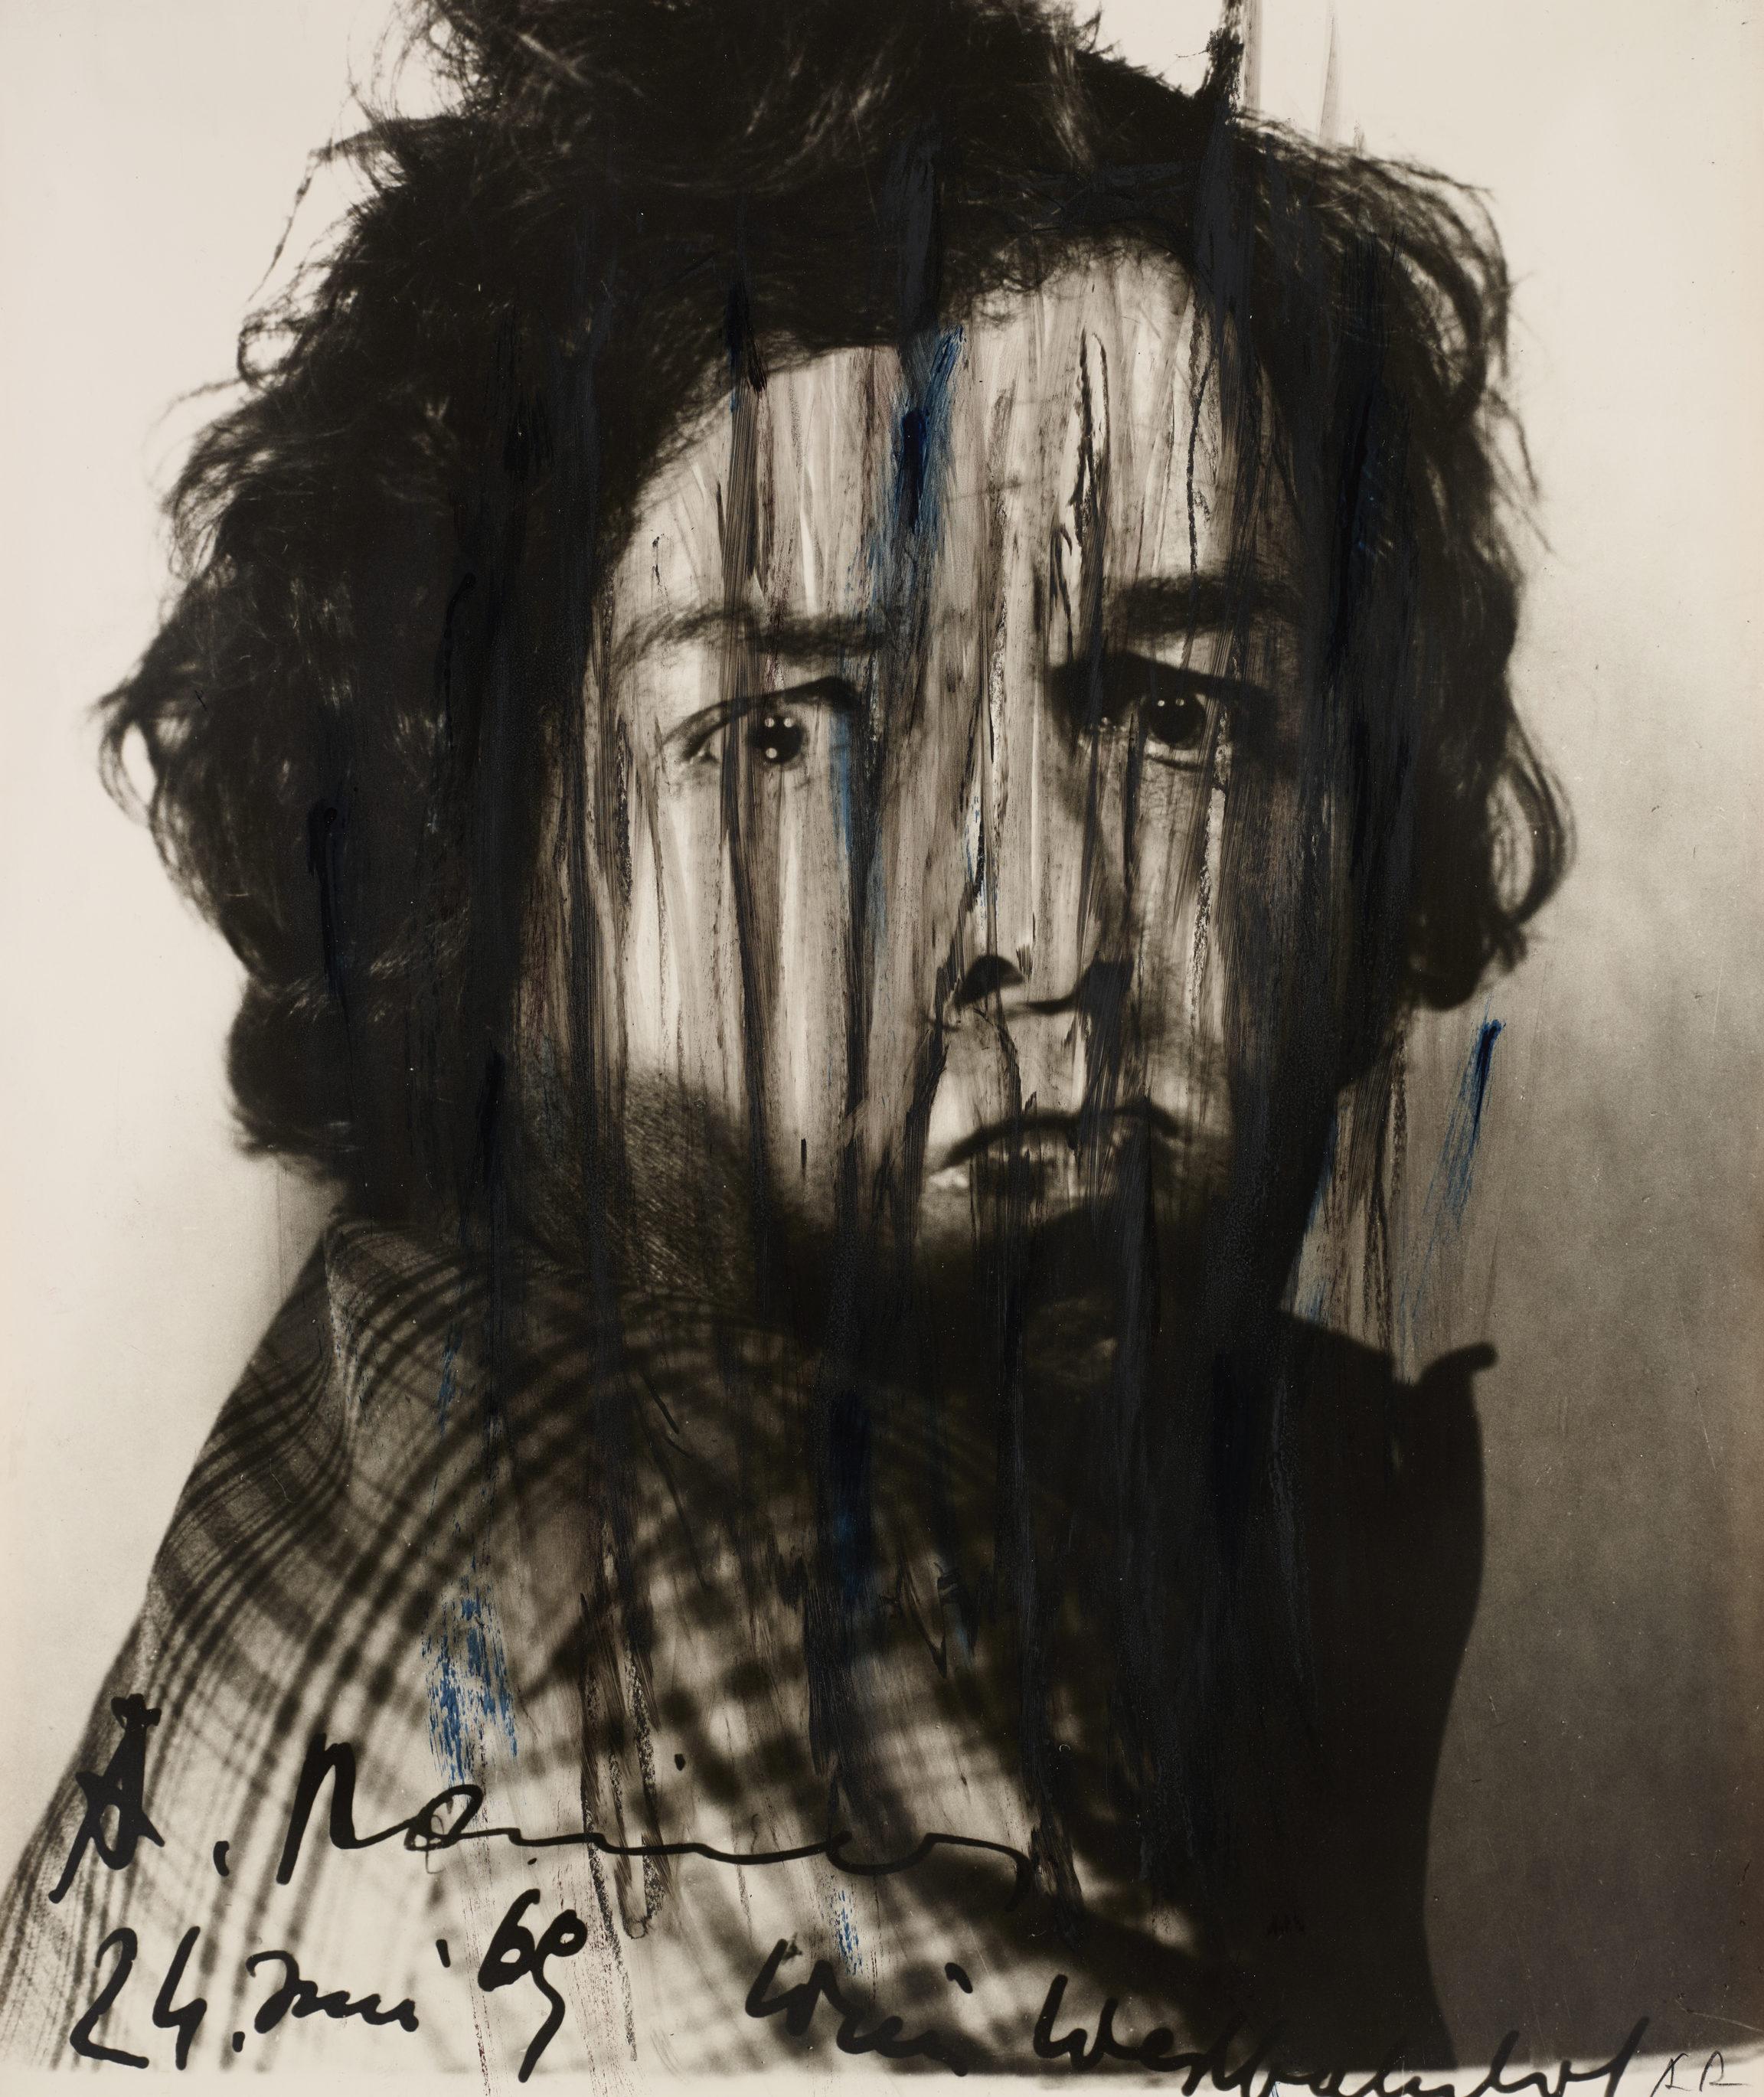 Arnulf Rainer, Ohne Titel (Face Farces) [Untitled (Face Farces)], 1969